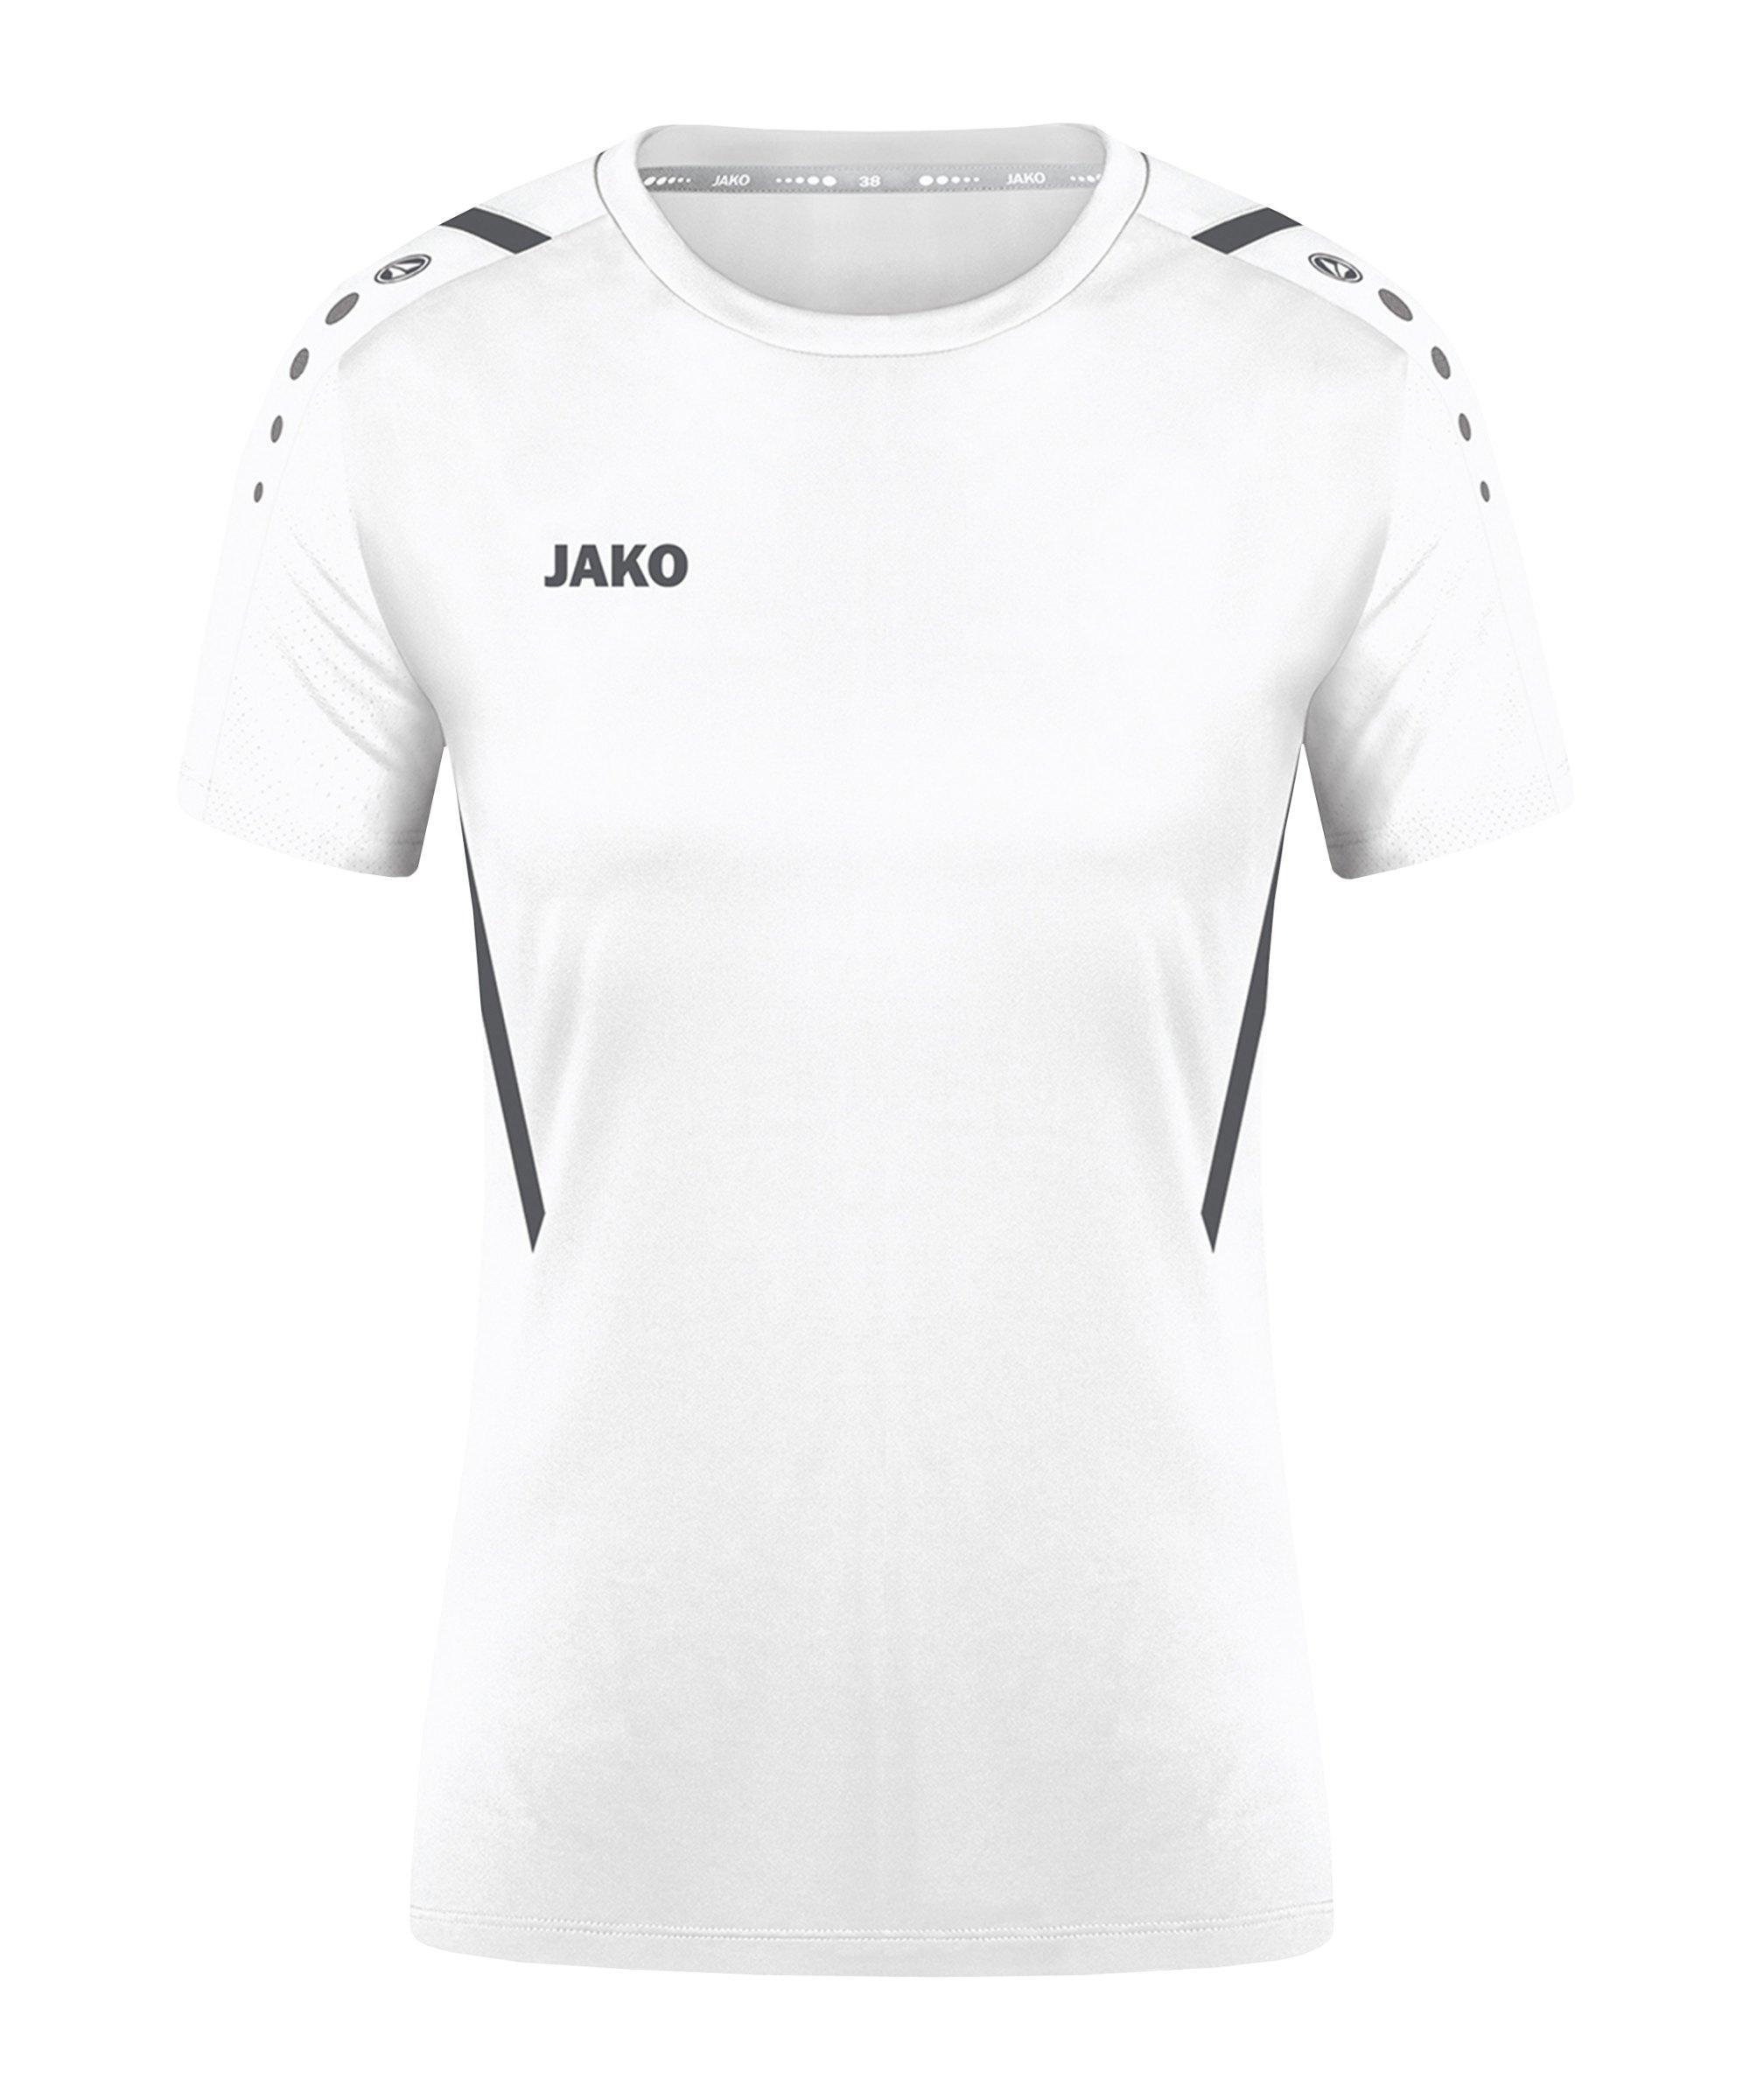 JAKO Challenge Trikot Damen Weiss Grau F02 - weiss